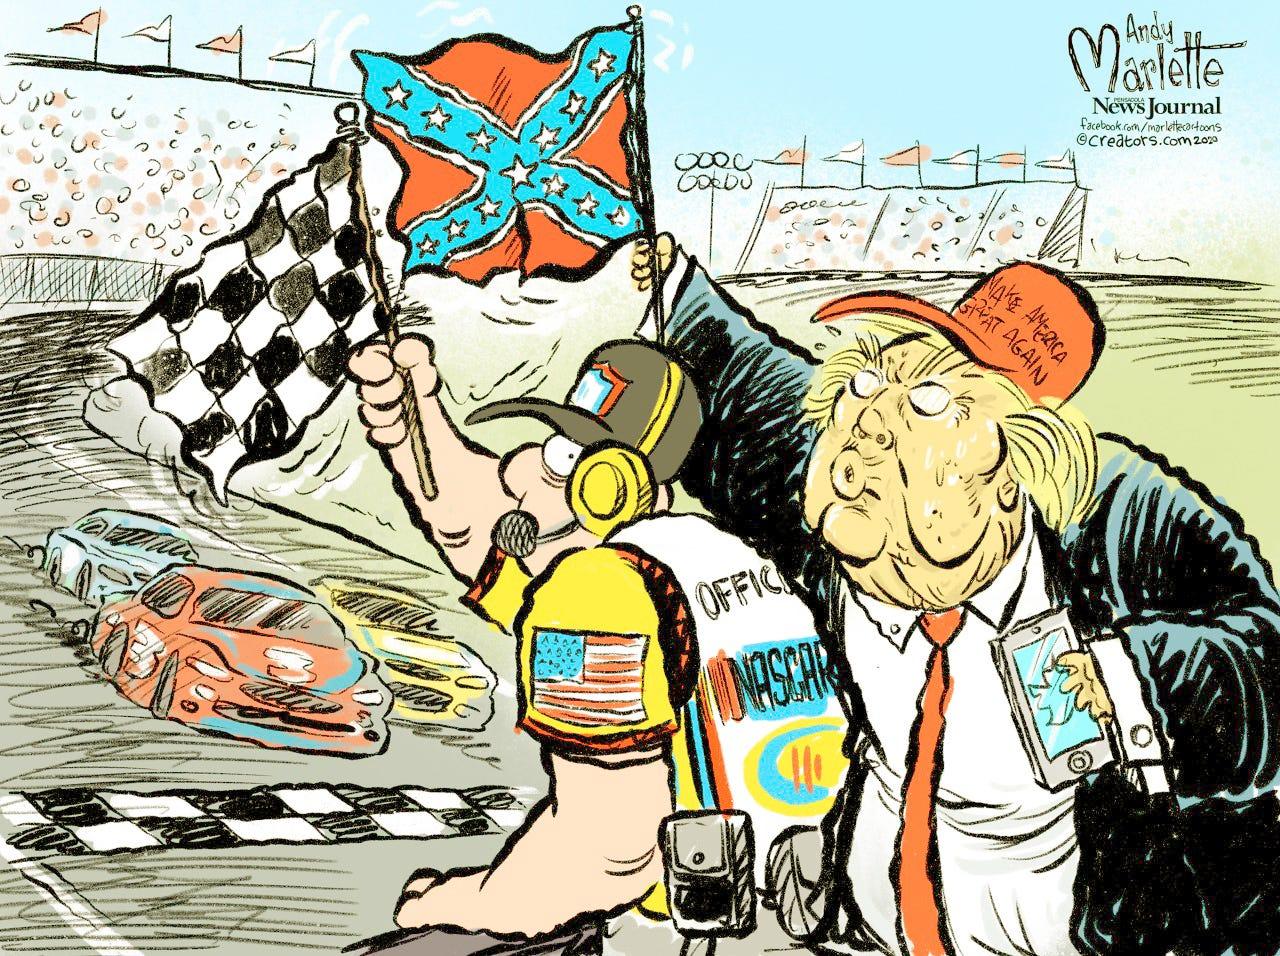 Andy Marlette editorial cartoon